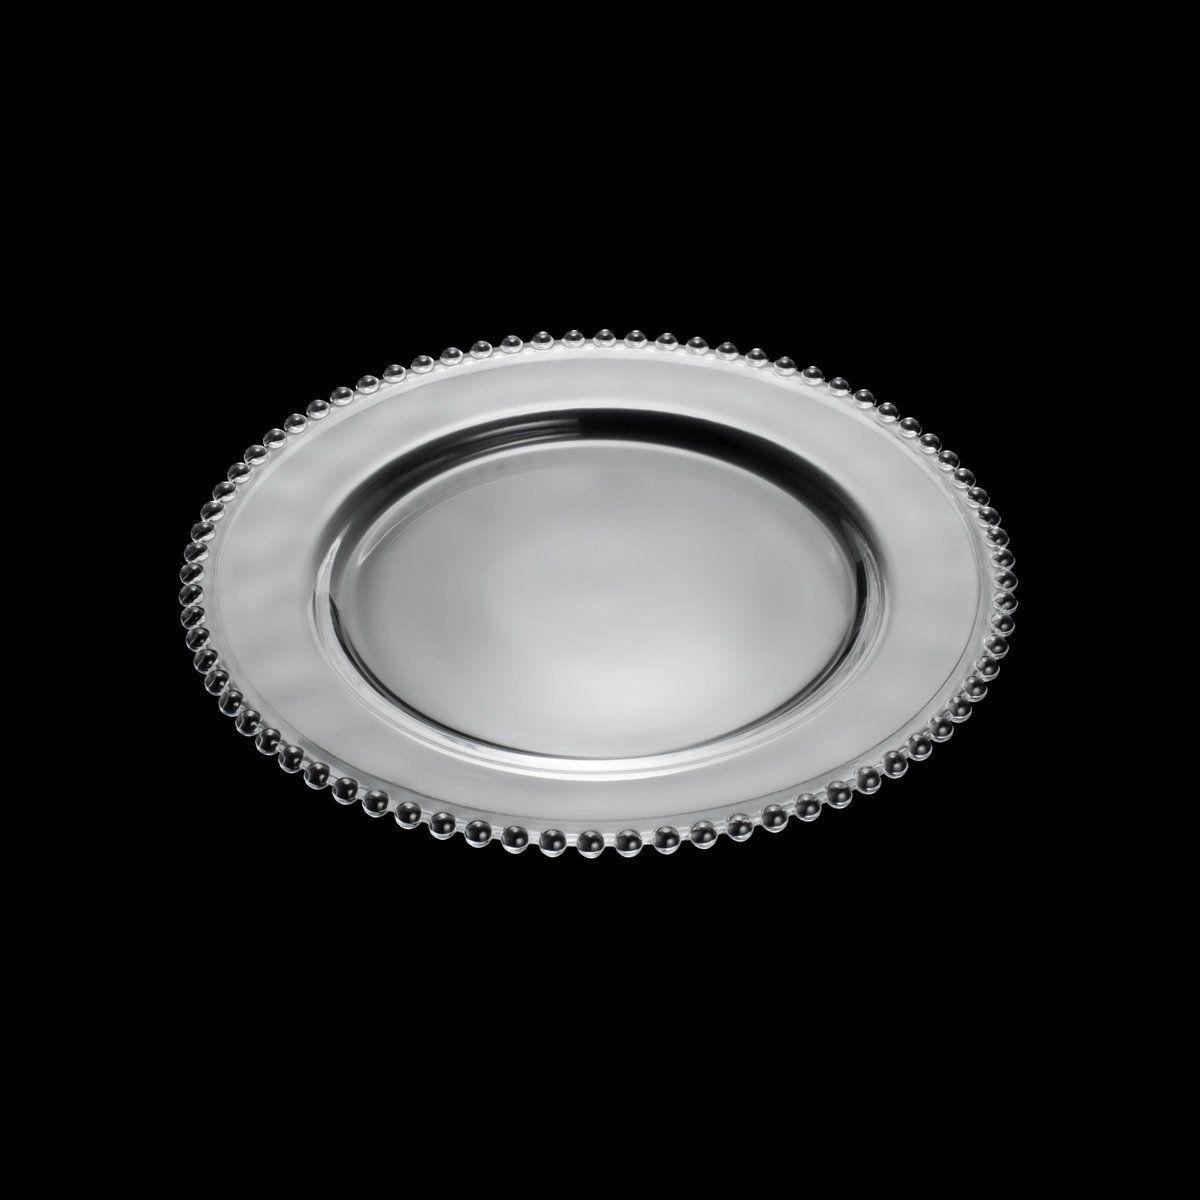 Sousplat Wolff Pearl 31,5cm em Cristal Transparente 2670